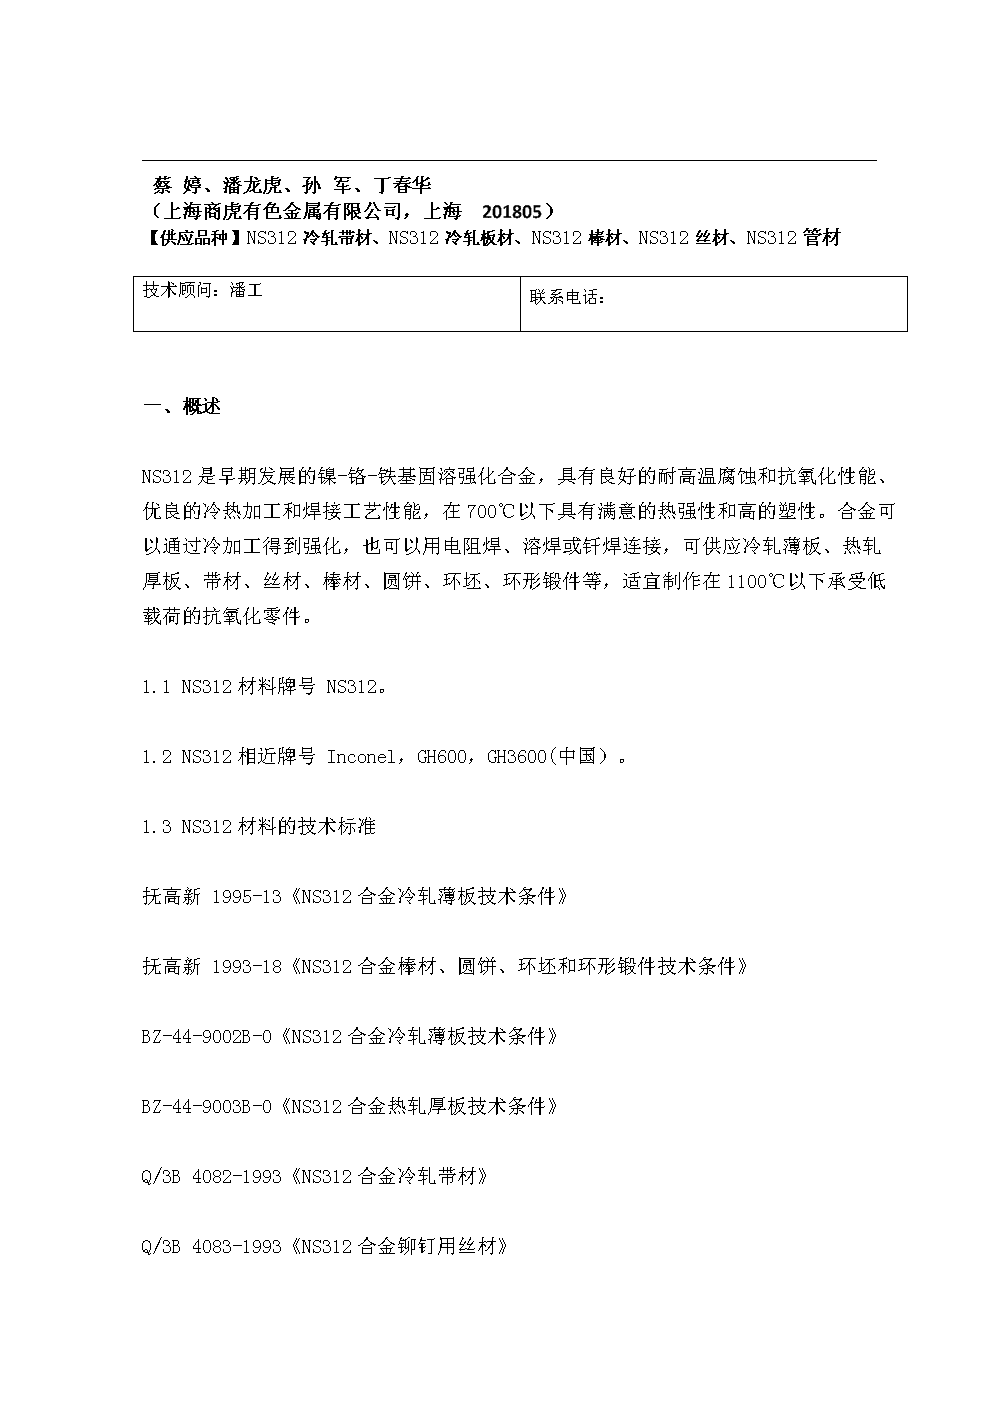 NS312-上海商虎合金技术.doc